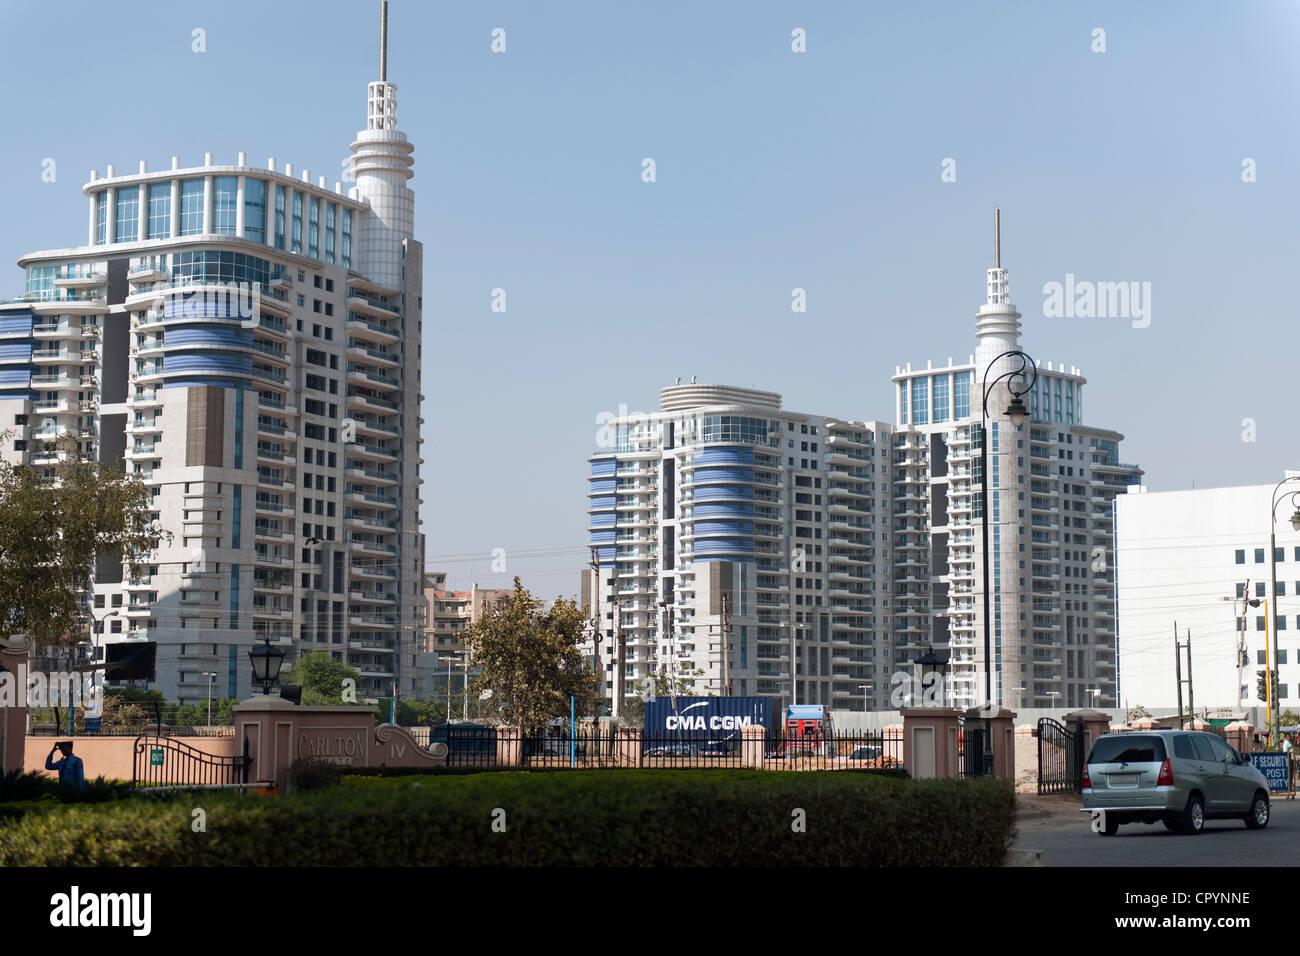 Nuove zone residenziali edifici ad alta, Gurgaon, Haryana, India, Asia Immagini Stock